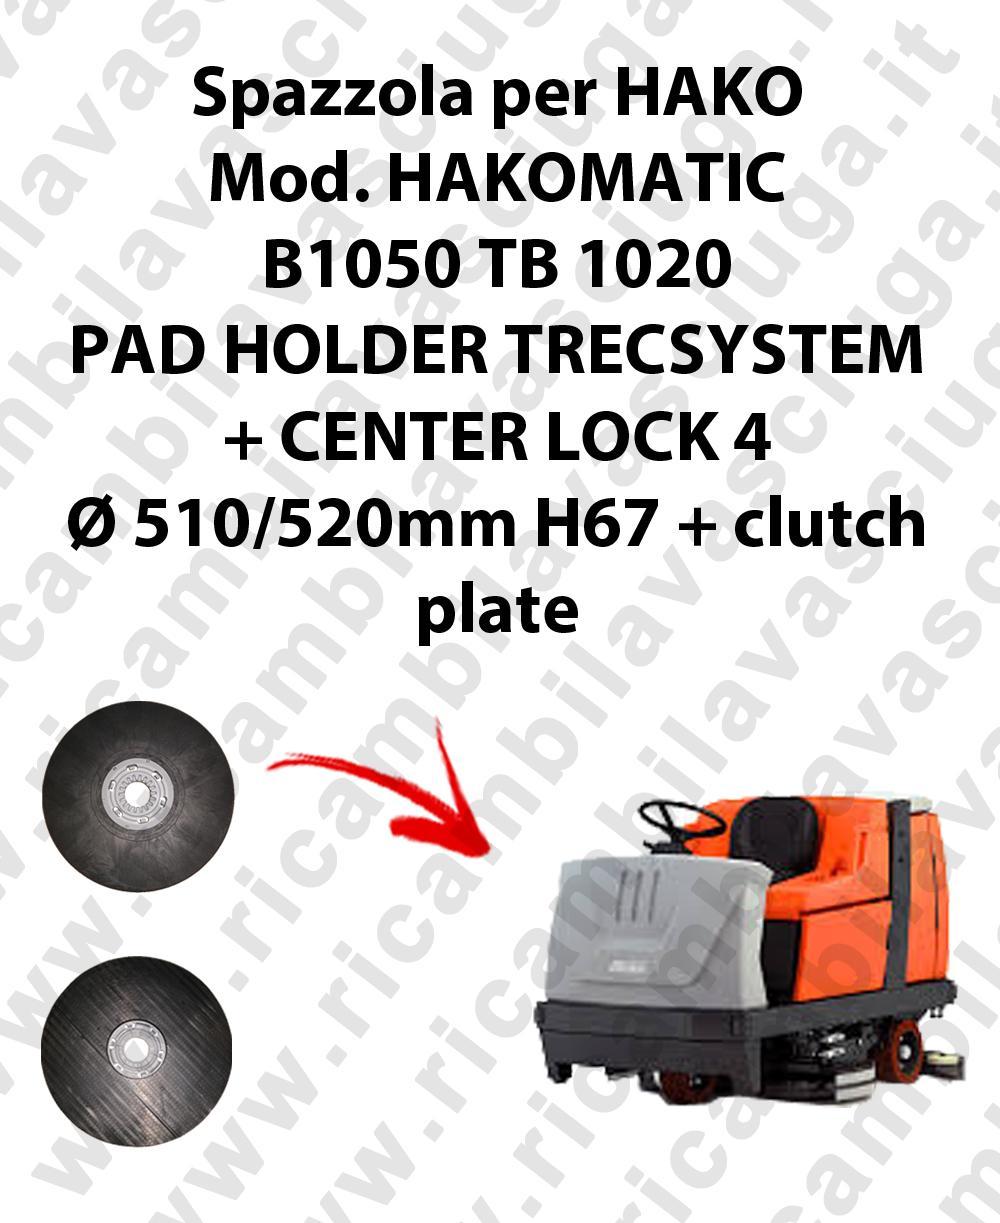 PAD HOLDER TRECSYSTEM  for scrubber dryer HAKO Model HAKOMATIC B1050 TB 1020